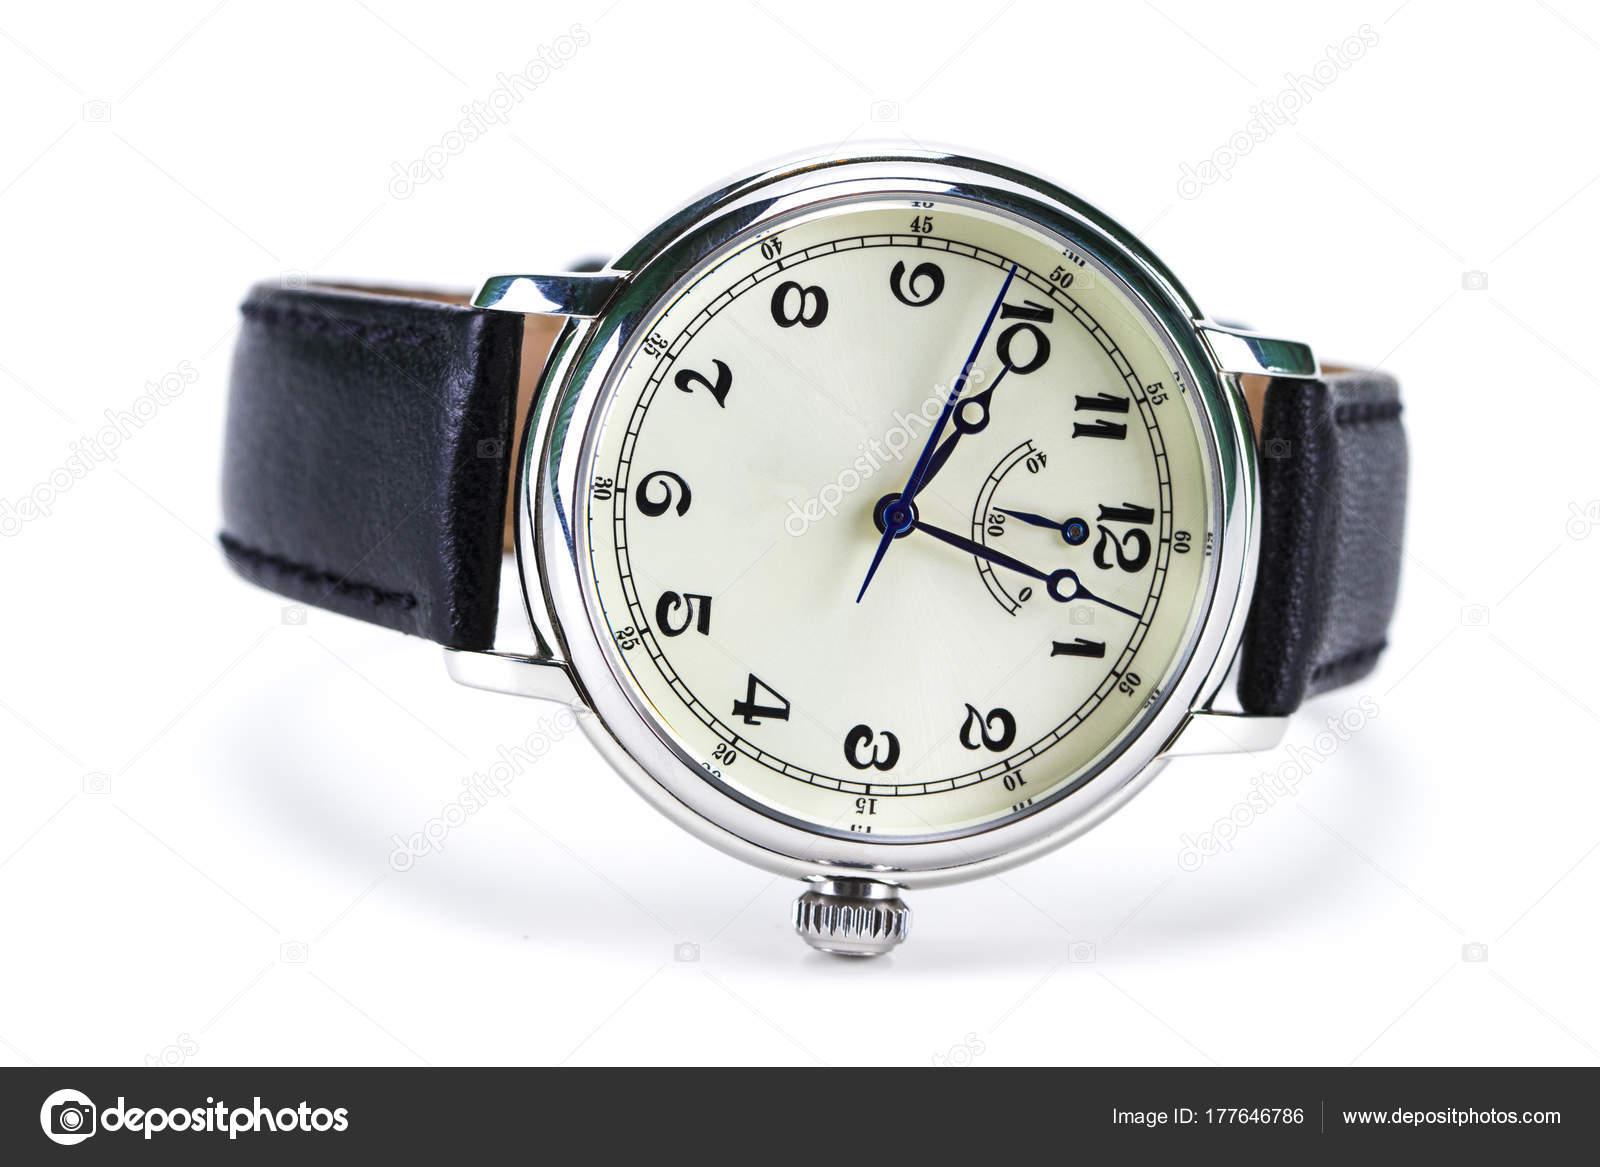 Pánské náramkové hodinky izolované na bílém pozadí — Fotografie od ... b6344e575d1